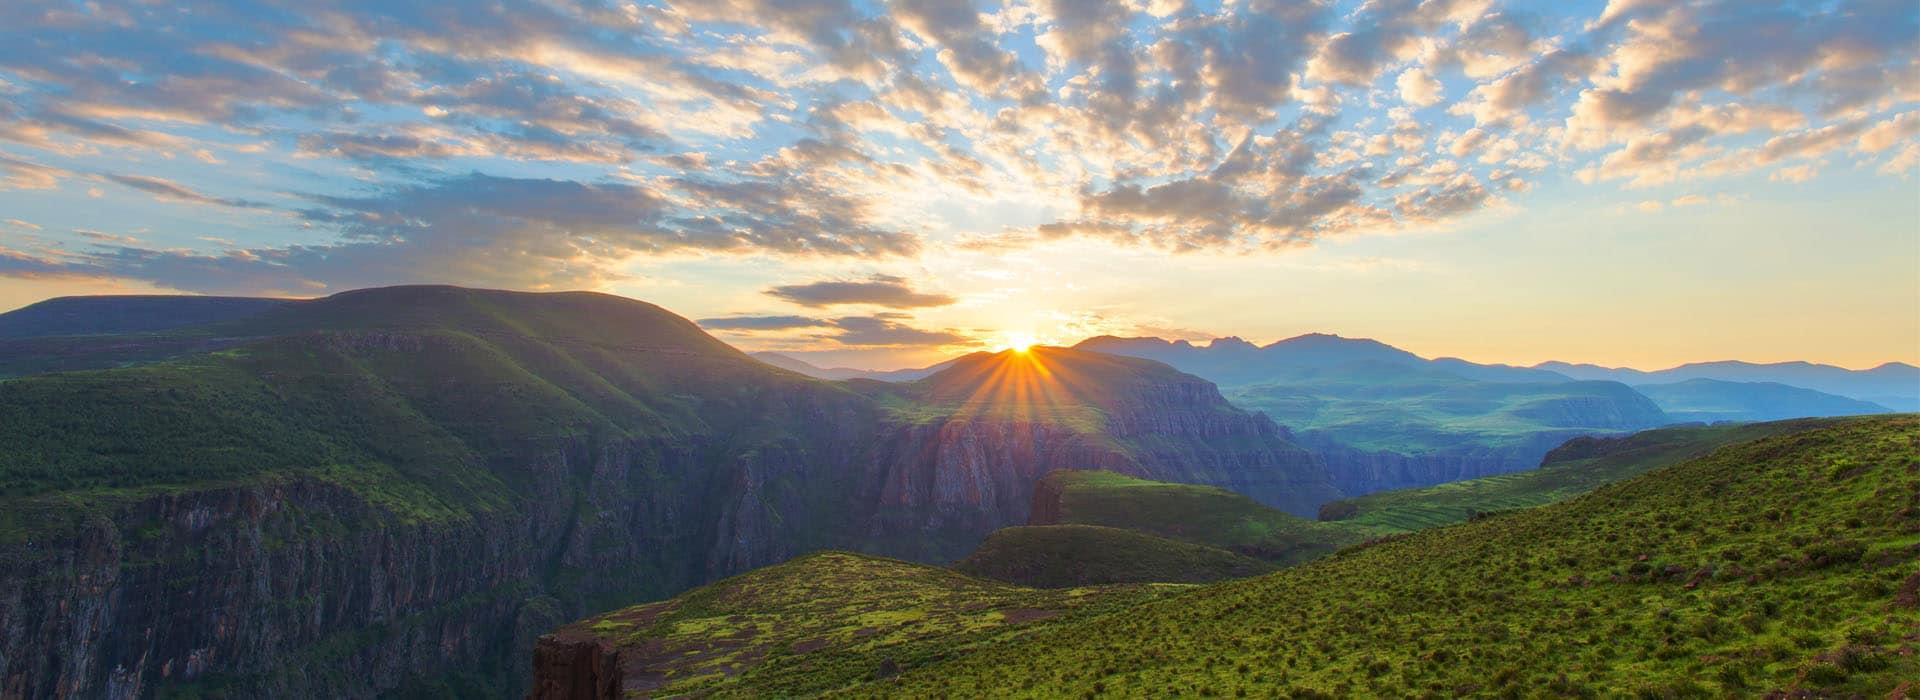 Sunrise view from hotel Maseru Lesotho